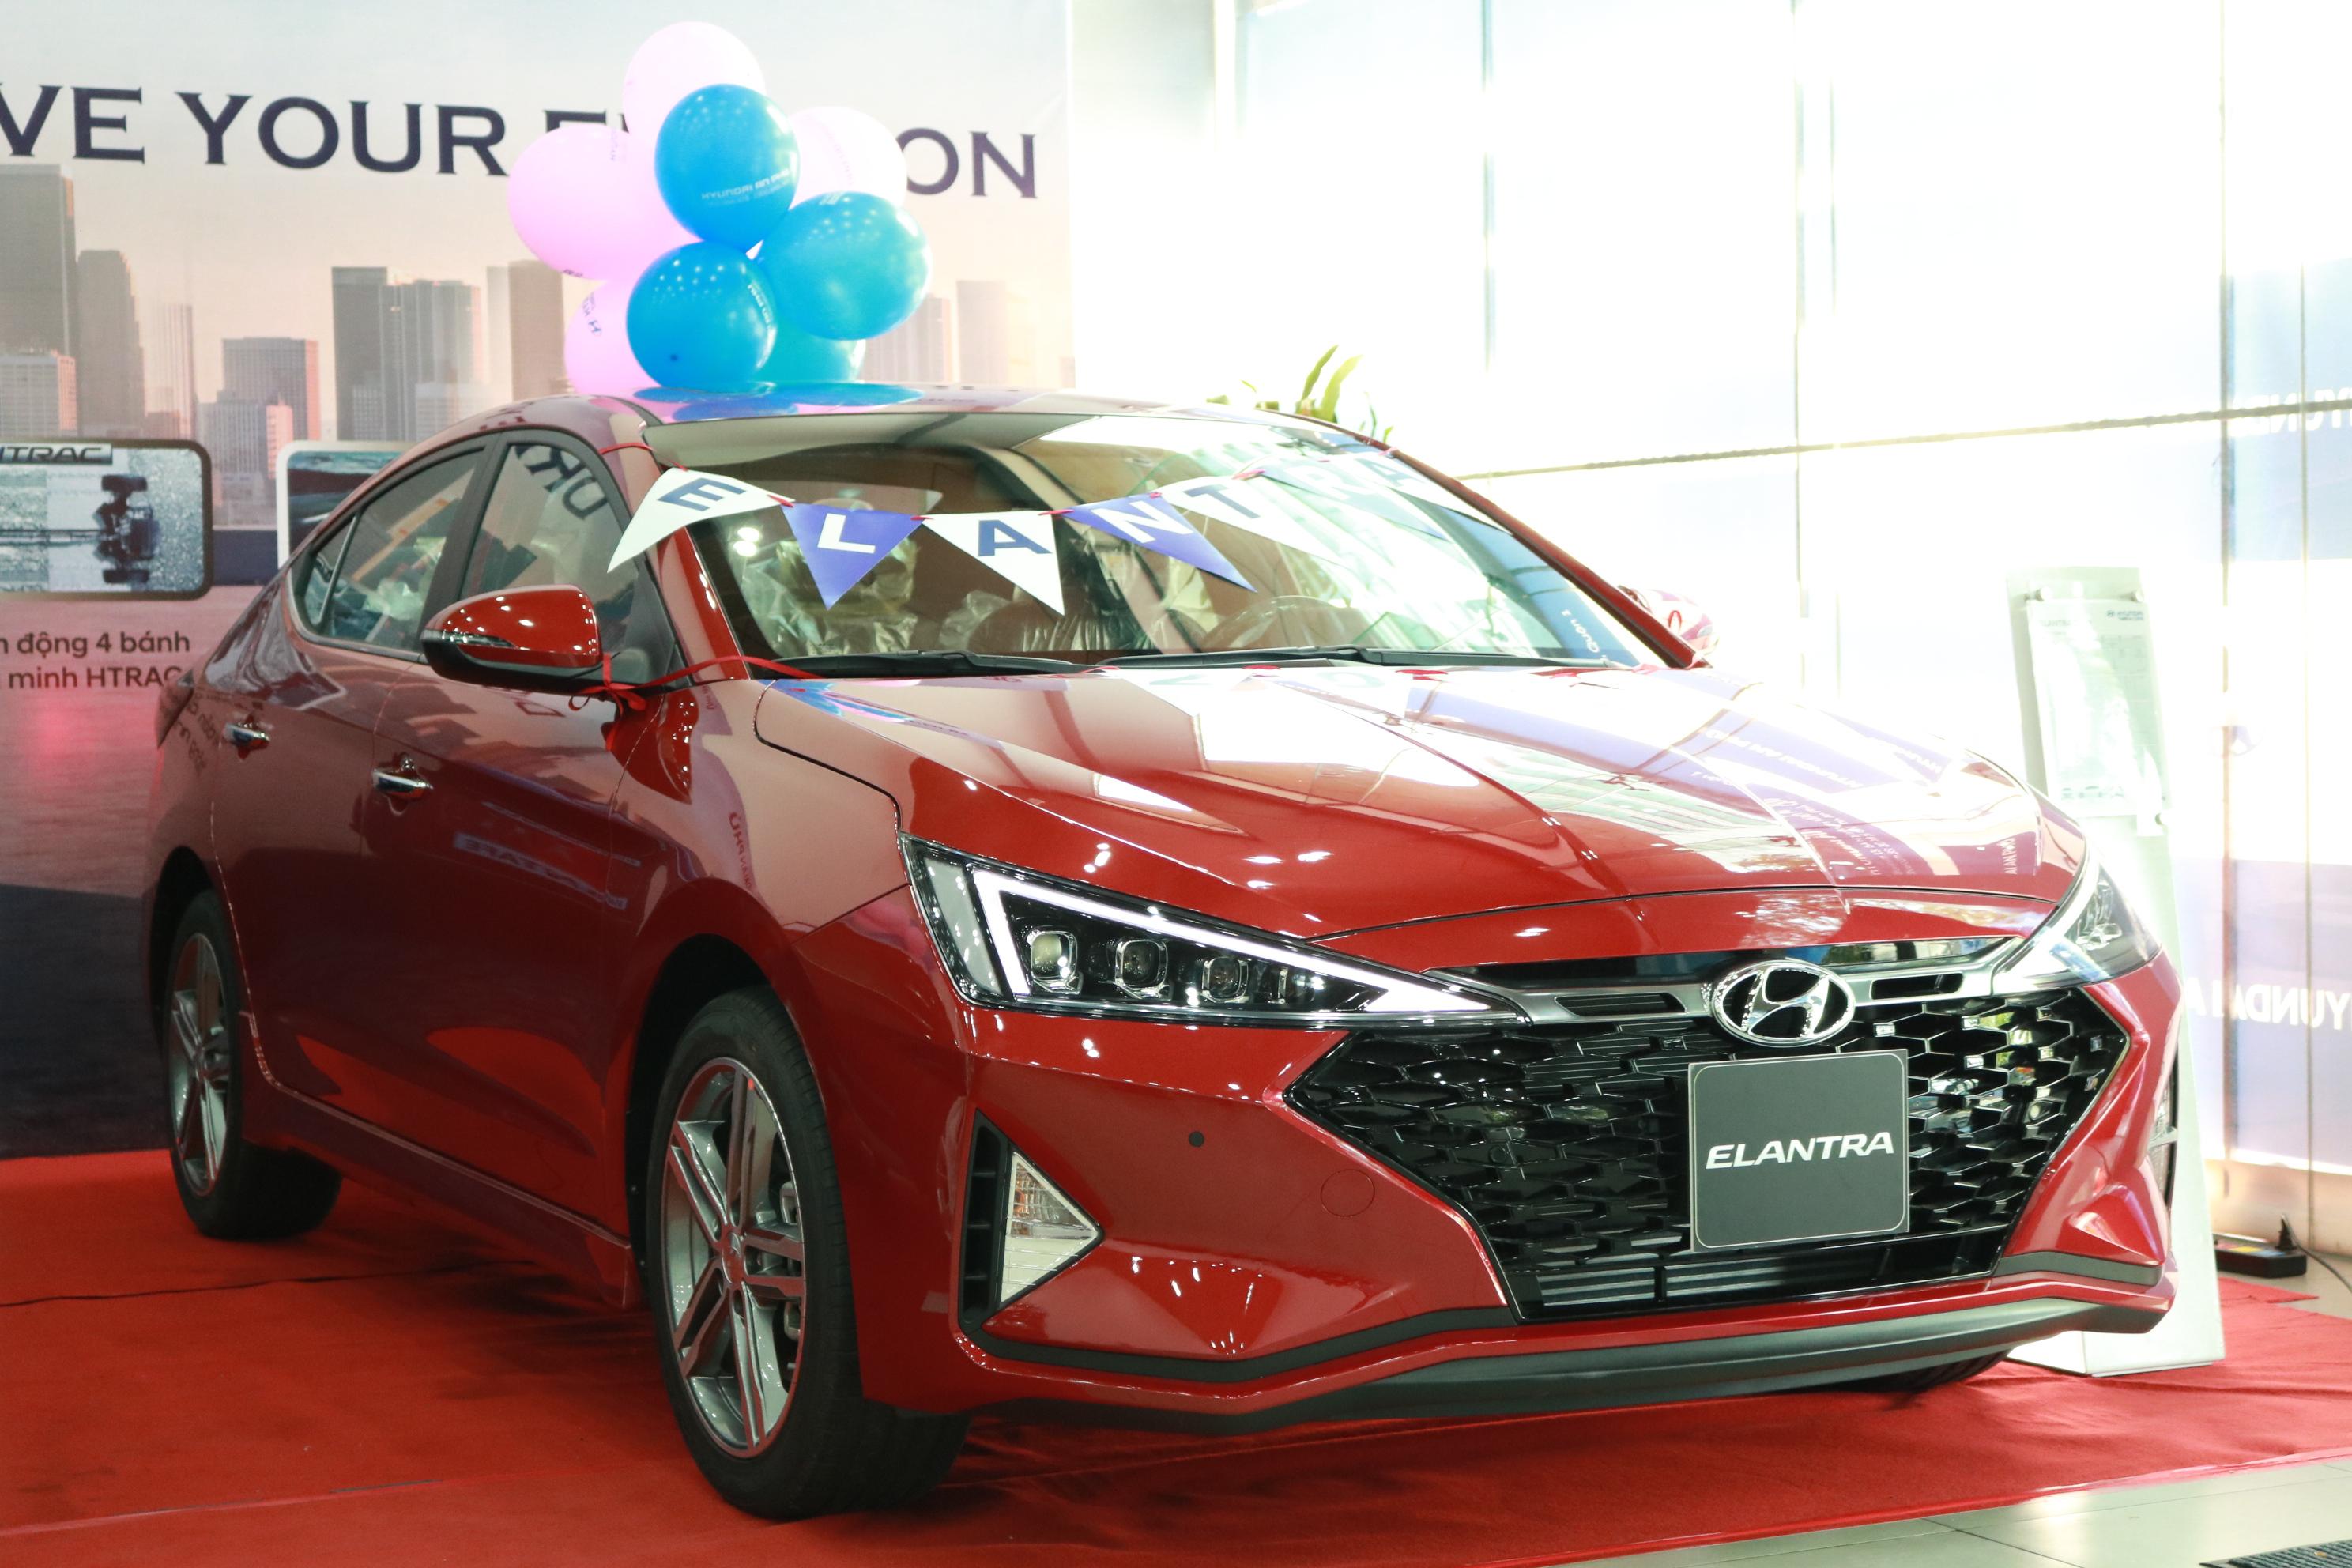 Hyundai Hyundai Elantra 2019 Sport giá tốt, Hyundai An Phú, Hyundai Elantra, Elantra 2019 Sport, Xe Hyundai